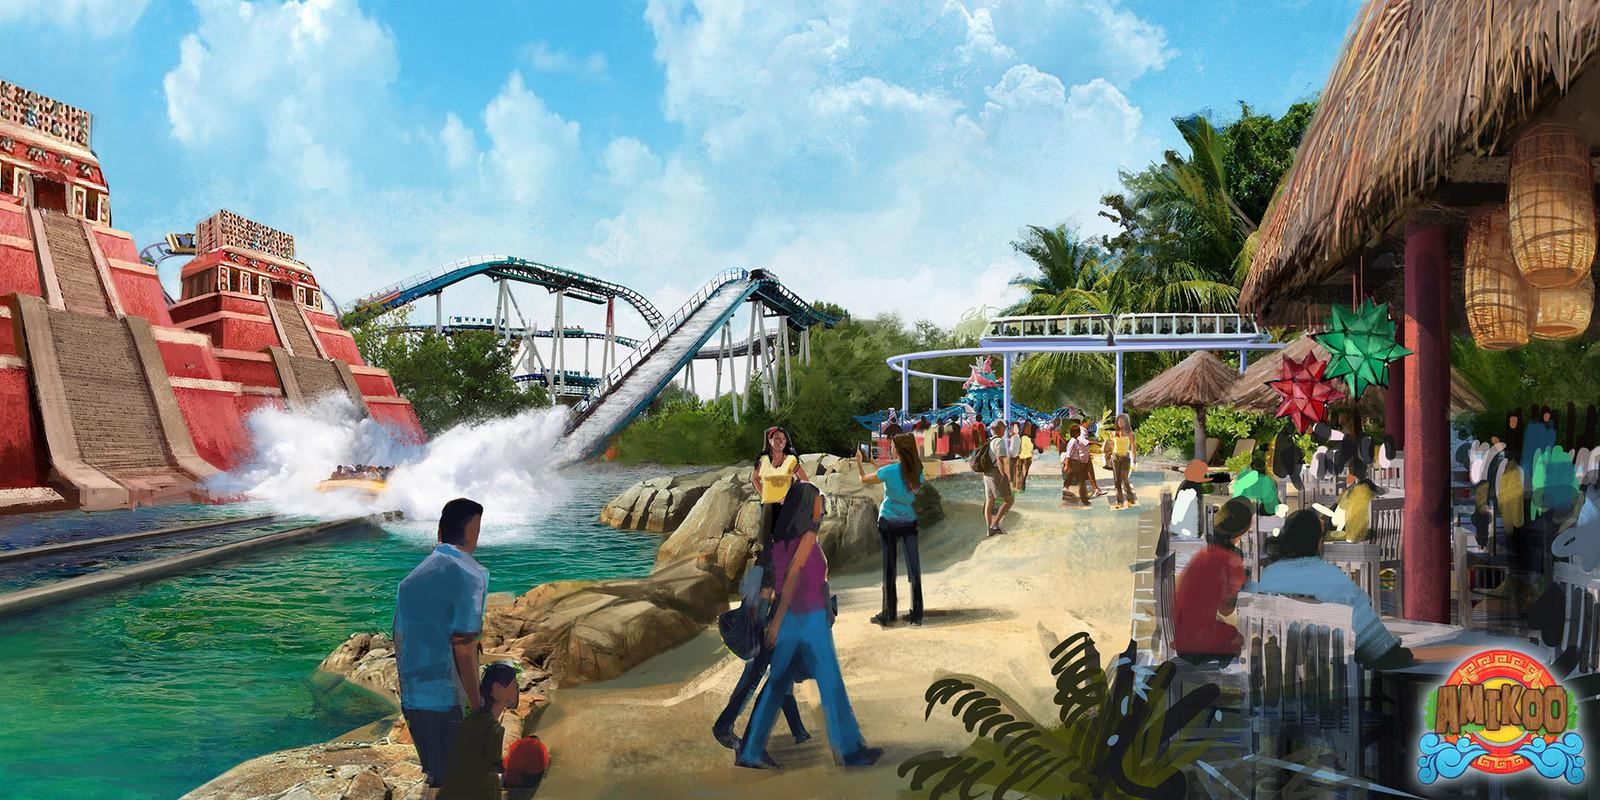 Amikoo Theme Park & Resort